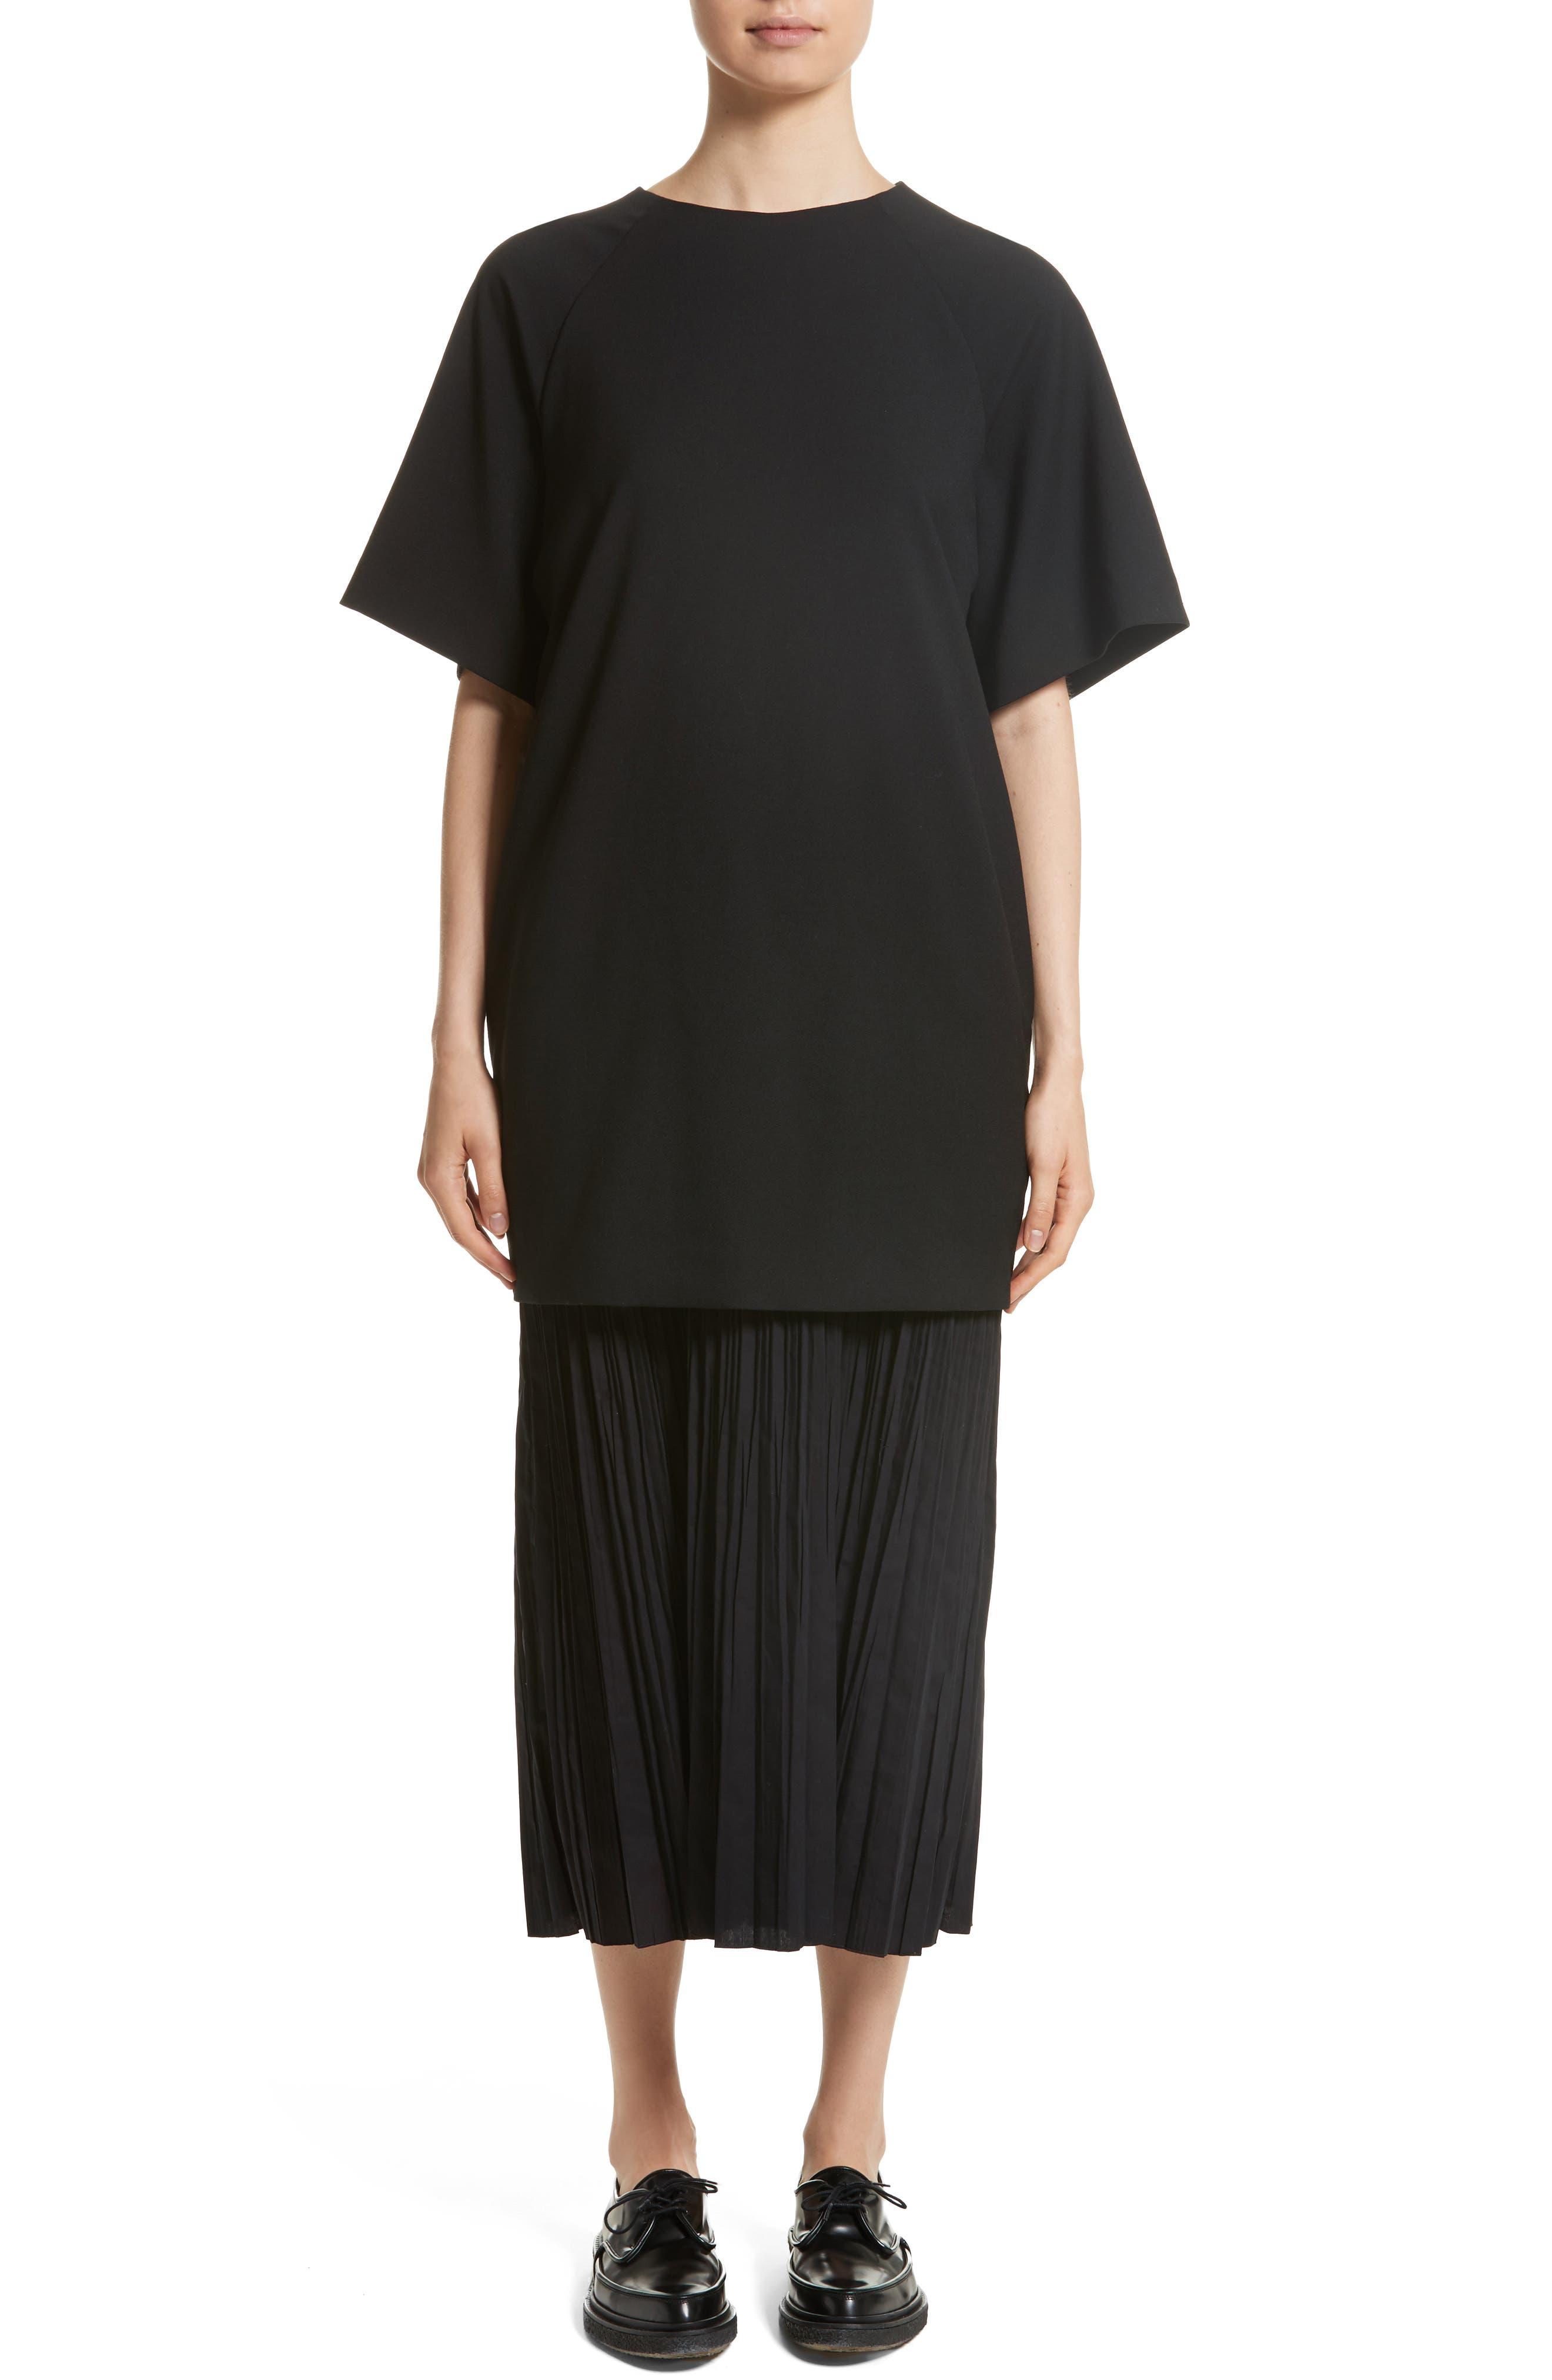 K Bottom Pleated Dress,                             Main thumbnail 1, color,                             001